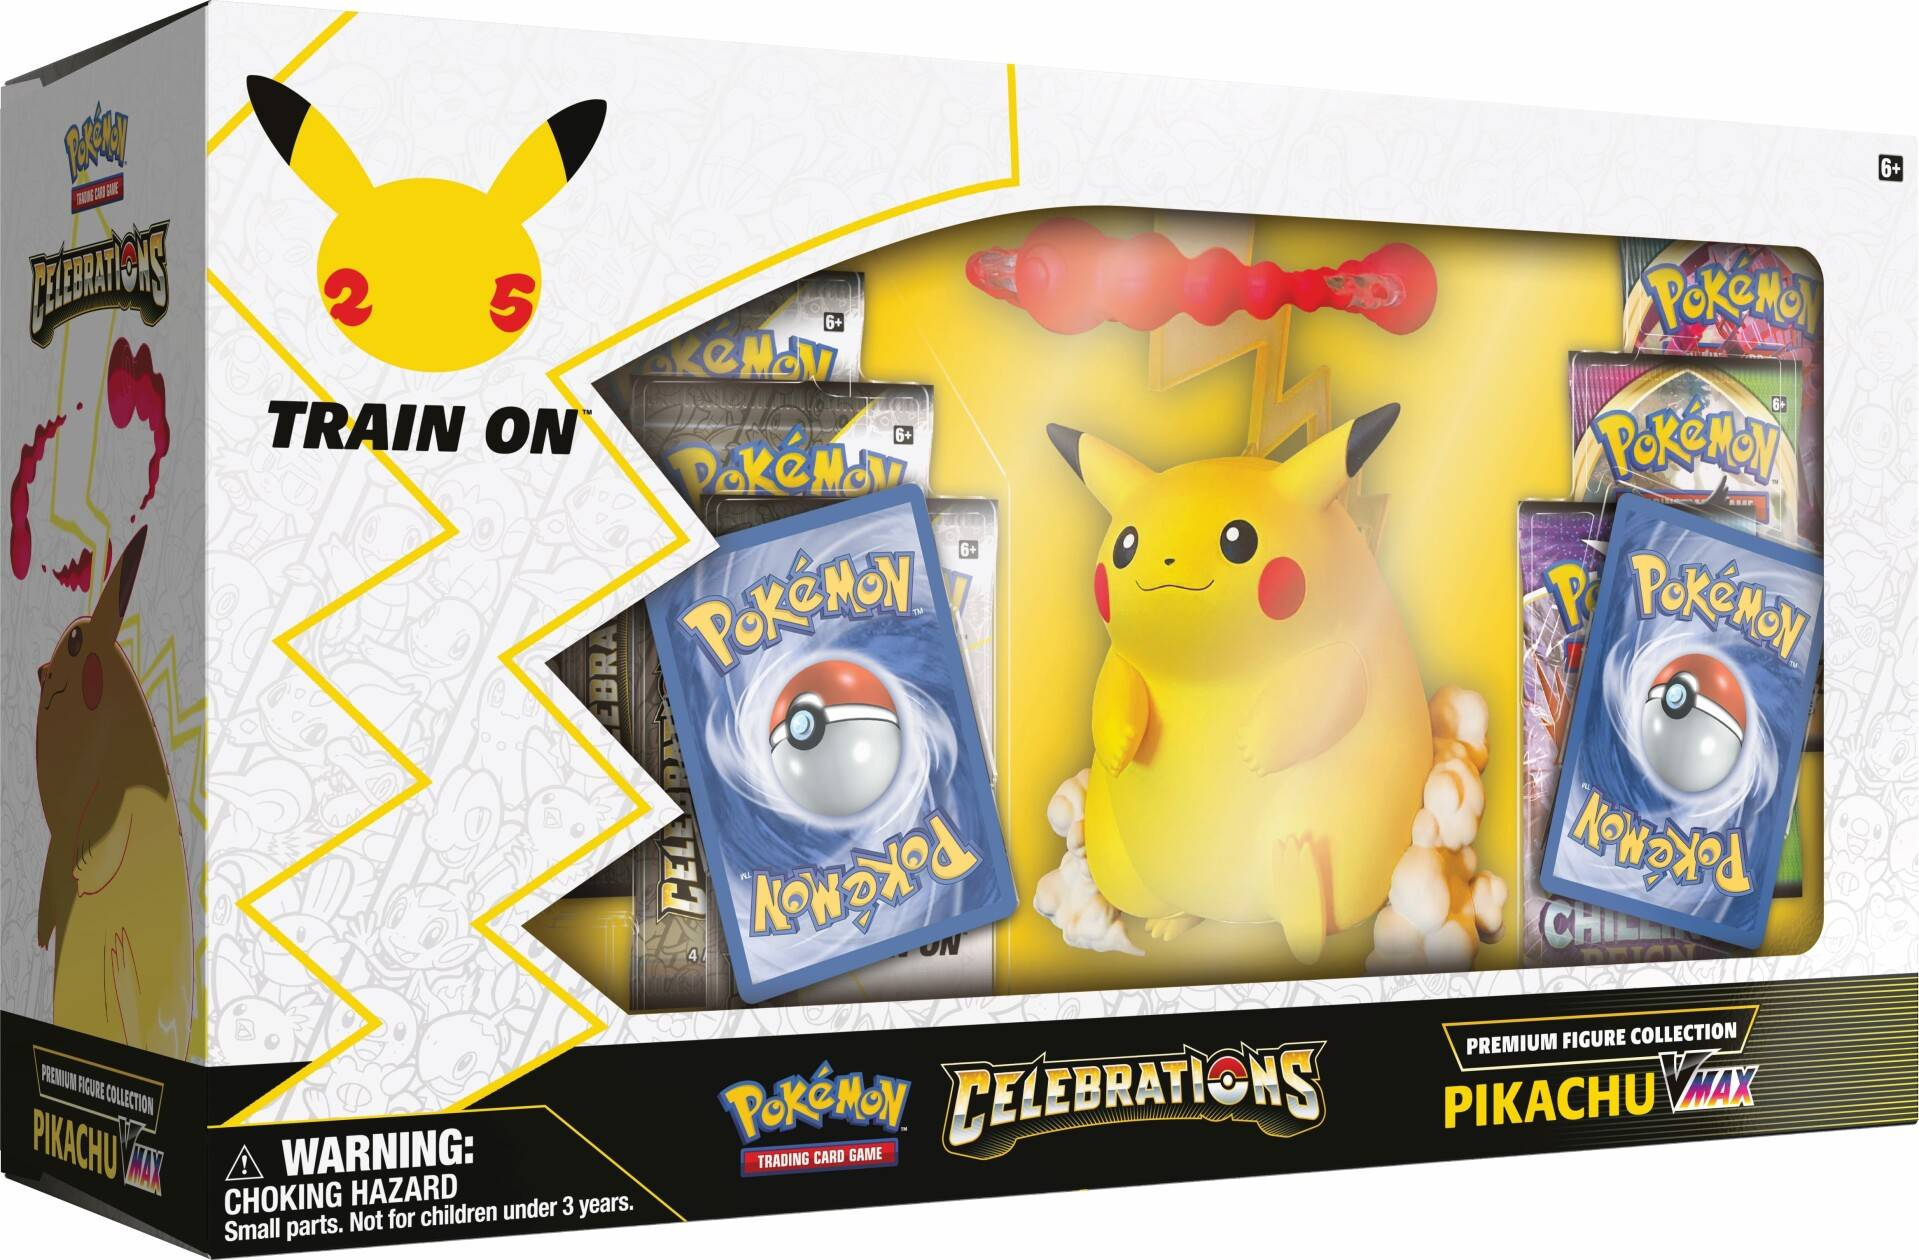 Pokemon-TCG-Celebrations-Premium-Figure-Collection